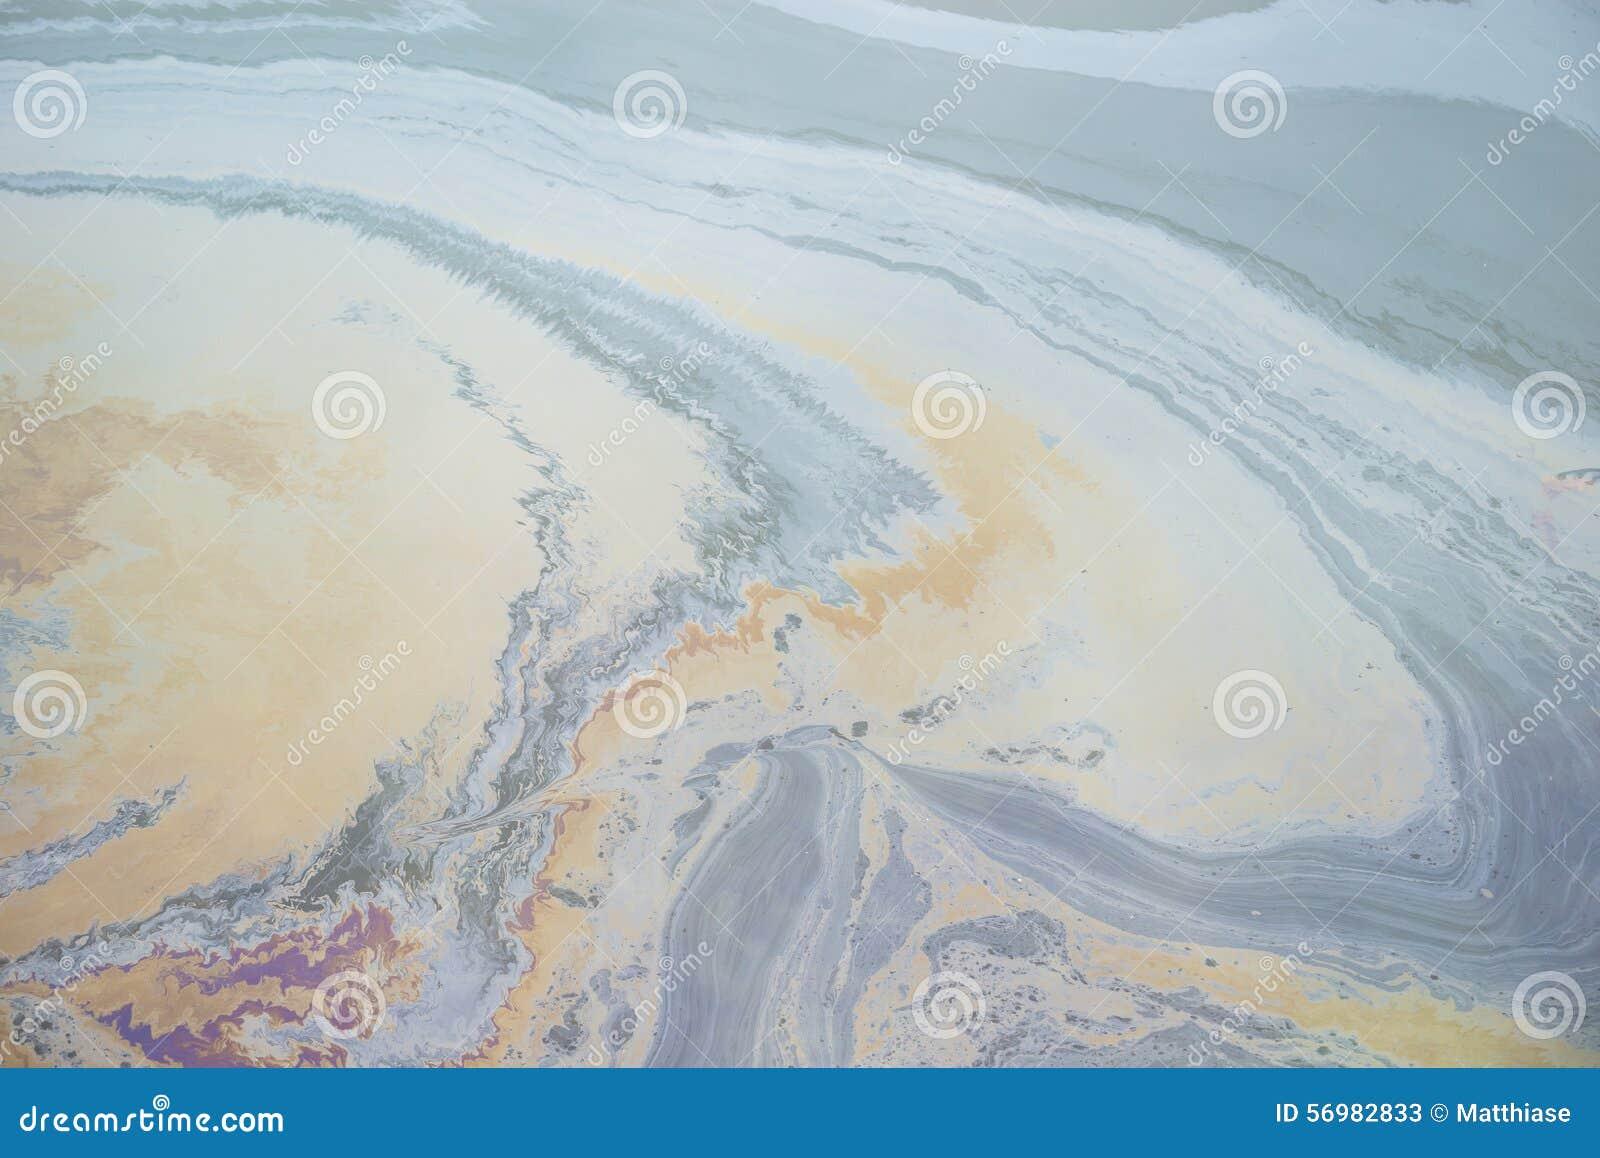 ÖlWasserverschmutzung